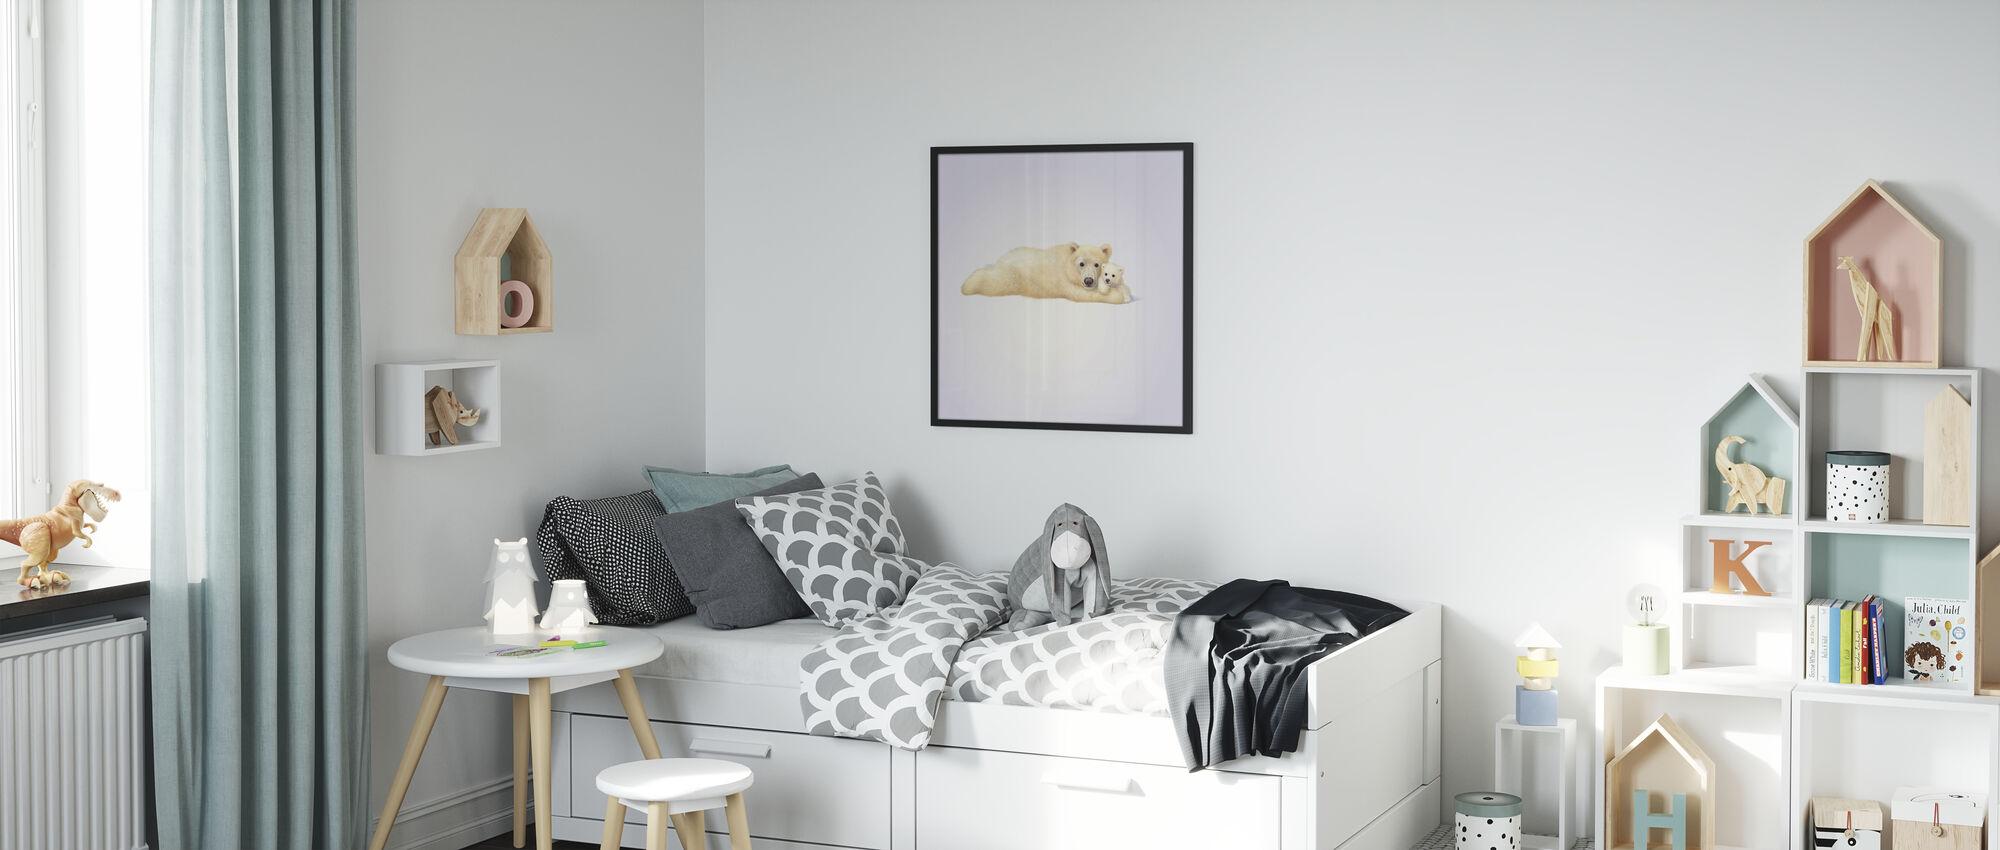 Polar Bear Cub - Poster - Kids Room